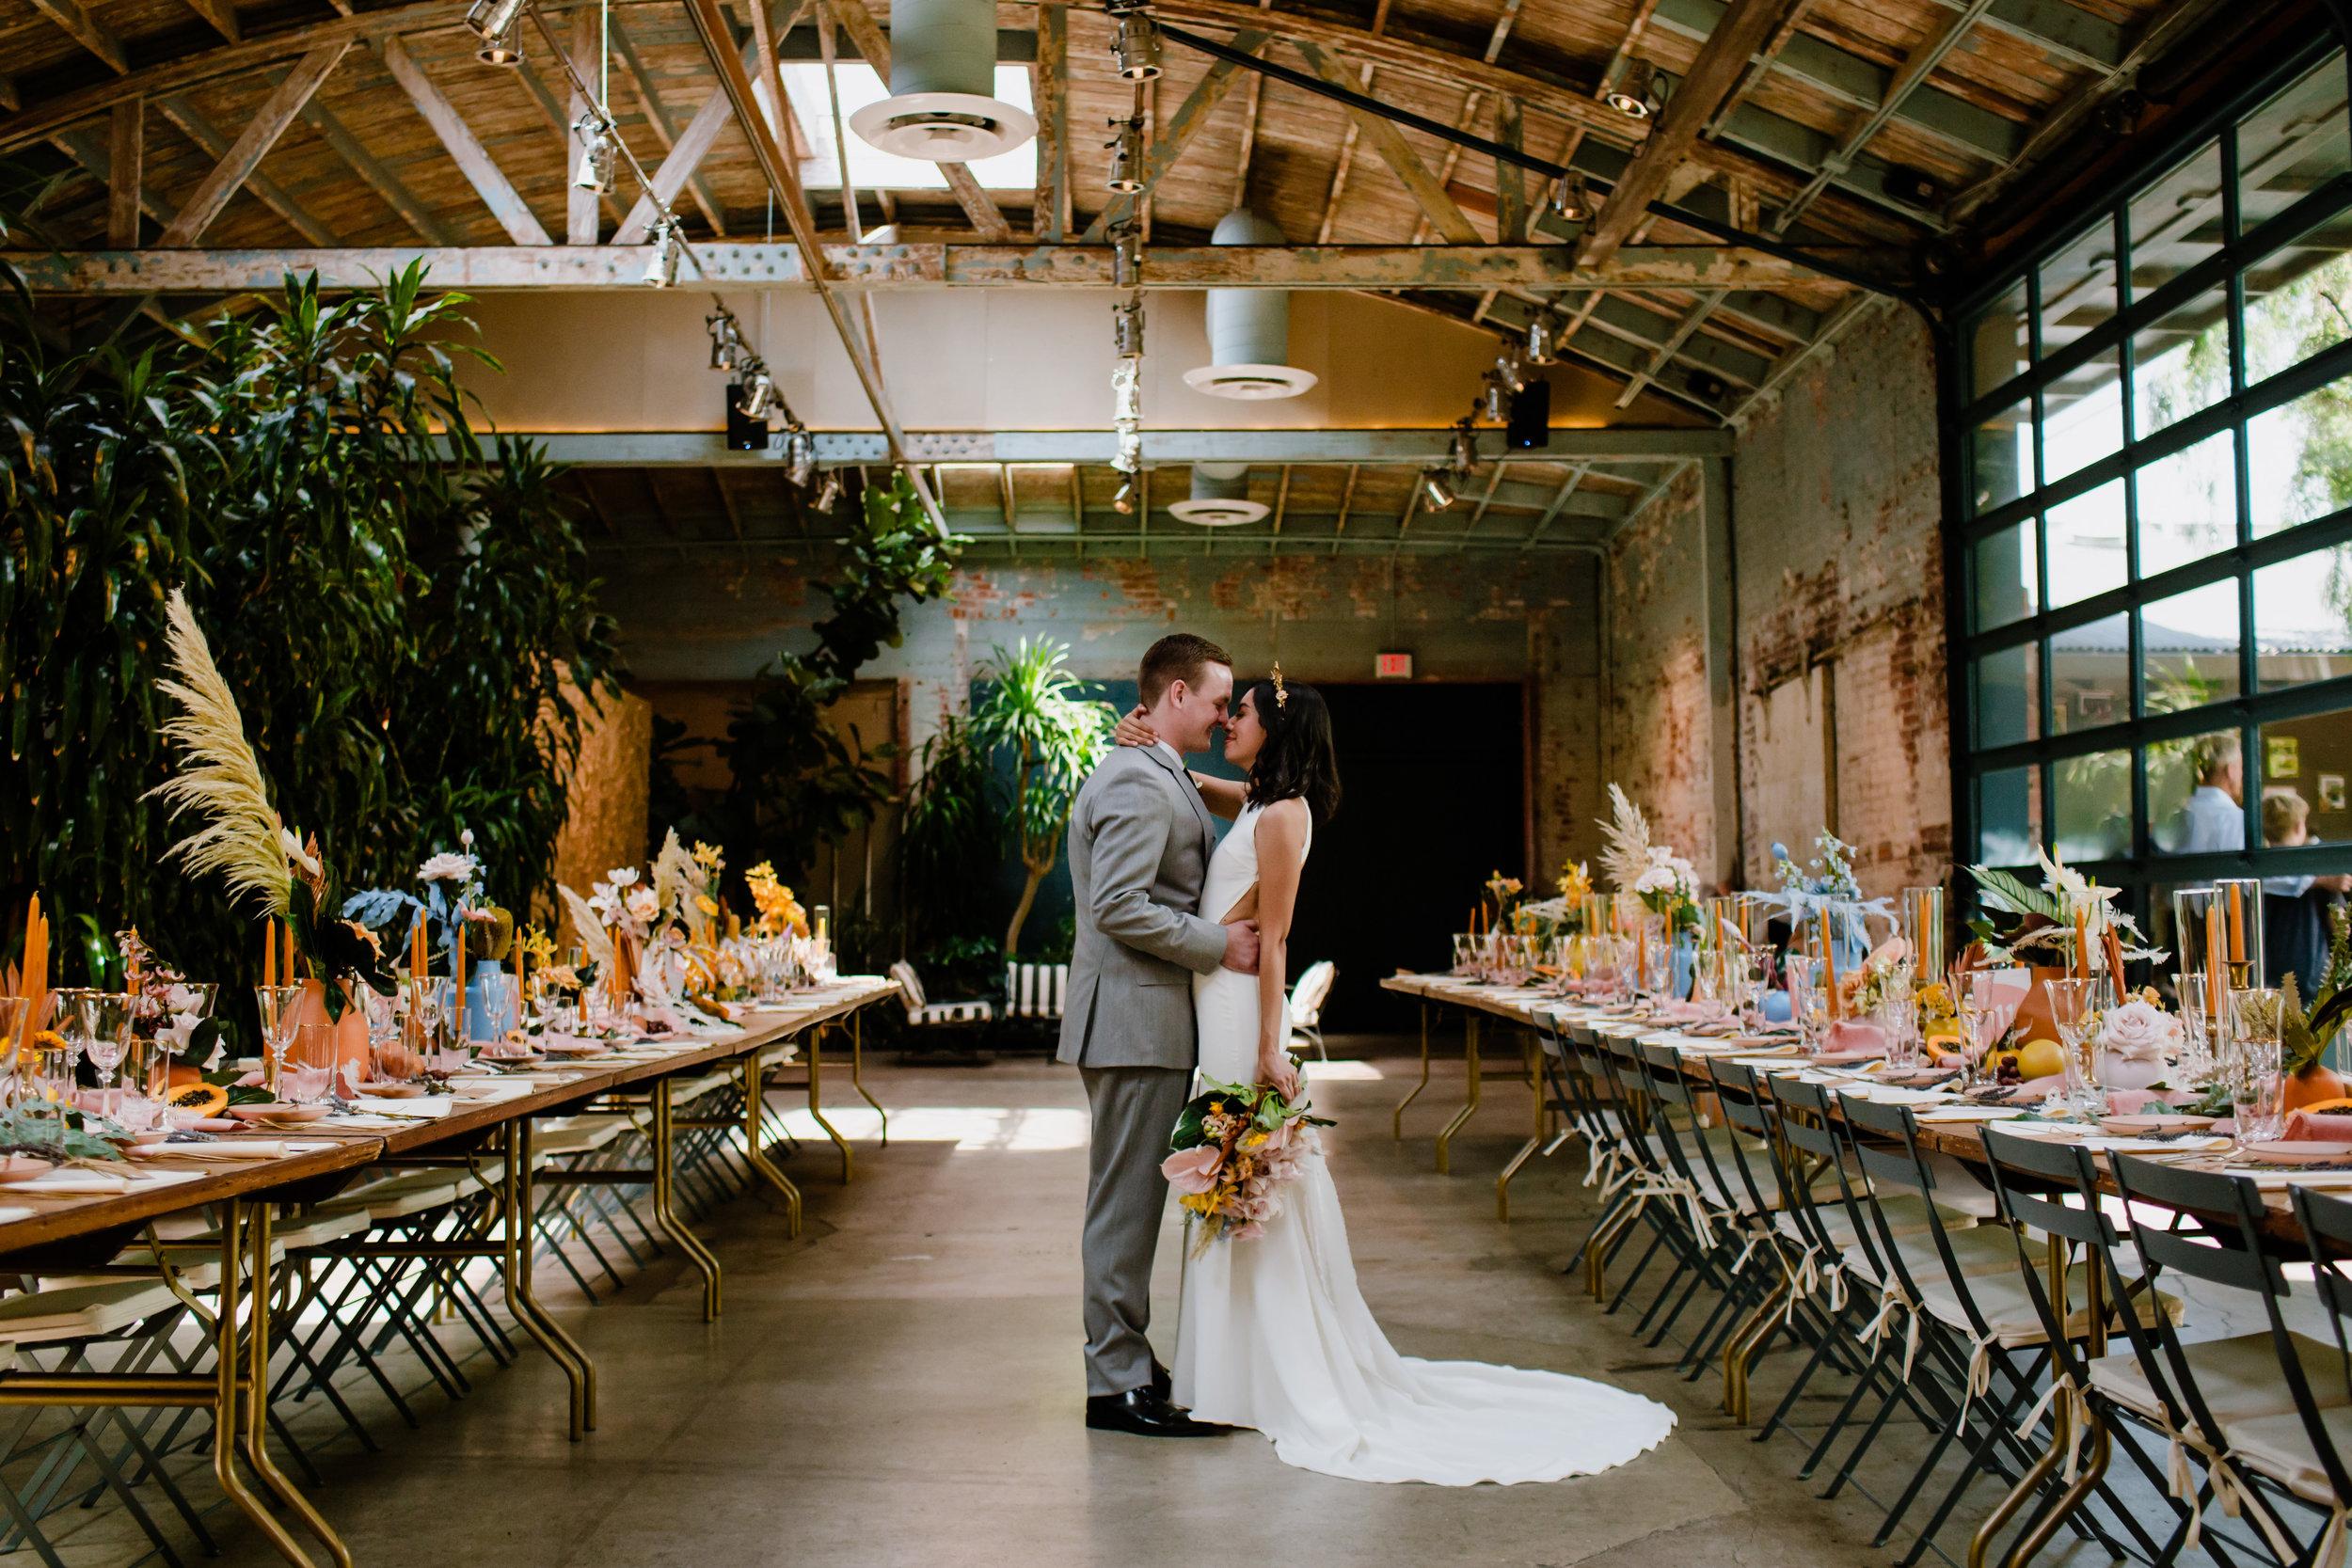 Sharon and Adam Downtown Los Angeles Arts District Wedding Millwick Venue - Eve Rox Photography-224.jpg